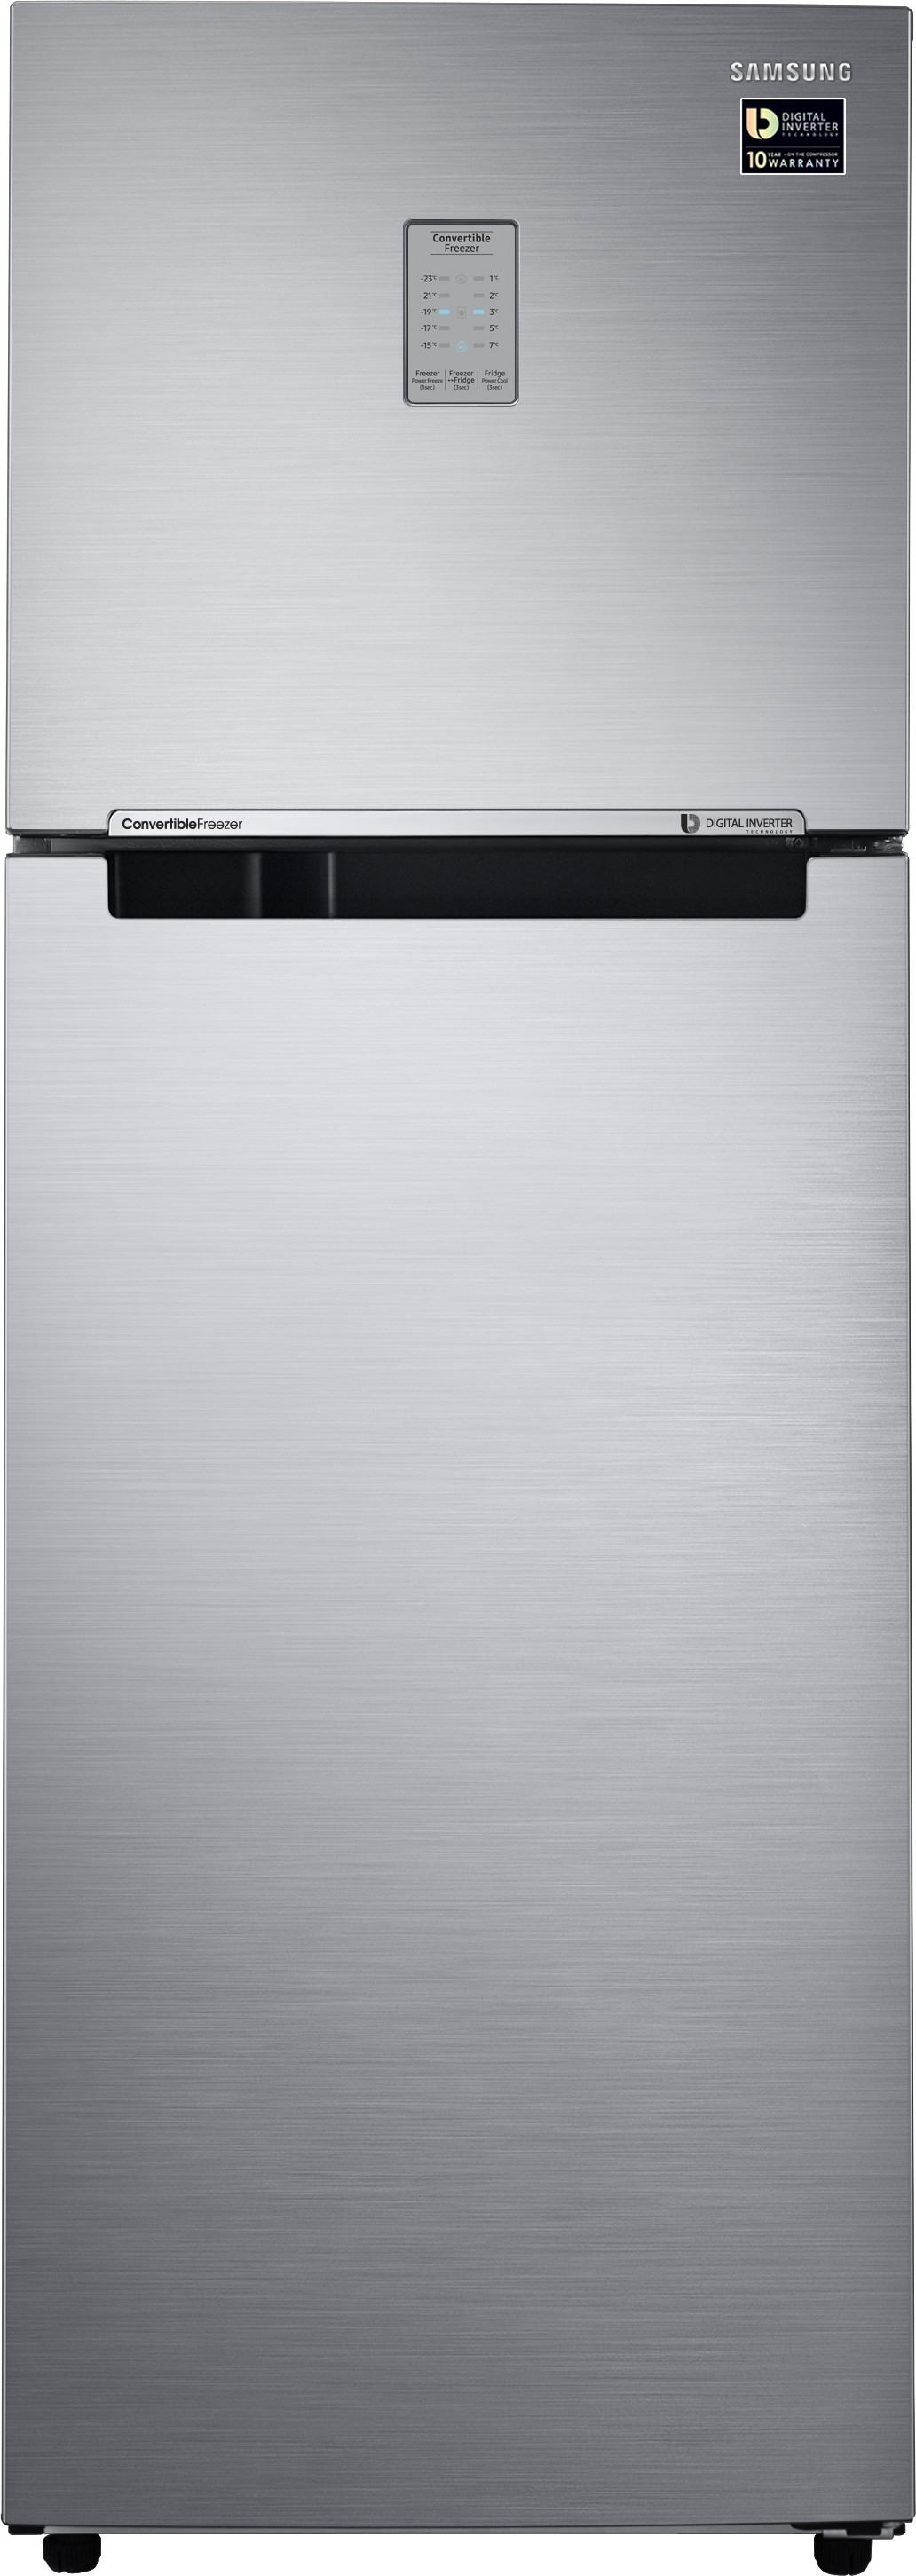 SAMSUNG 321 L Frost Free Double Door Refrigerator(RT34M3723S8/HL, Elegant Inox, 2017) (Samsung) Tamil Nadu Buy Online